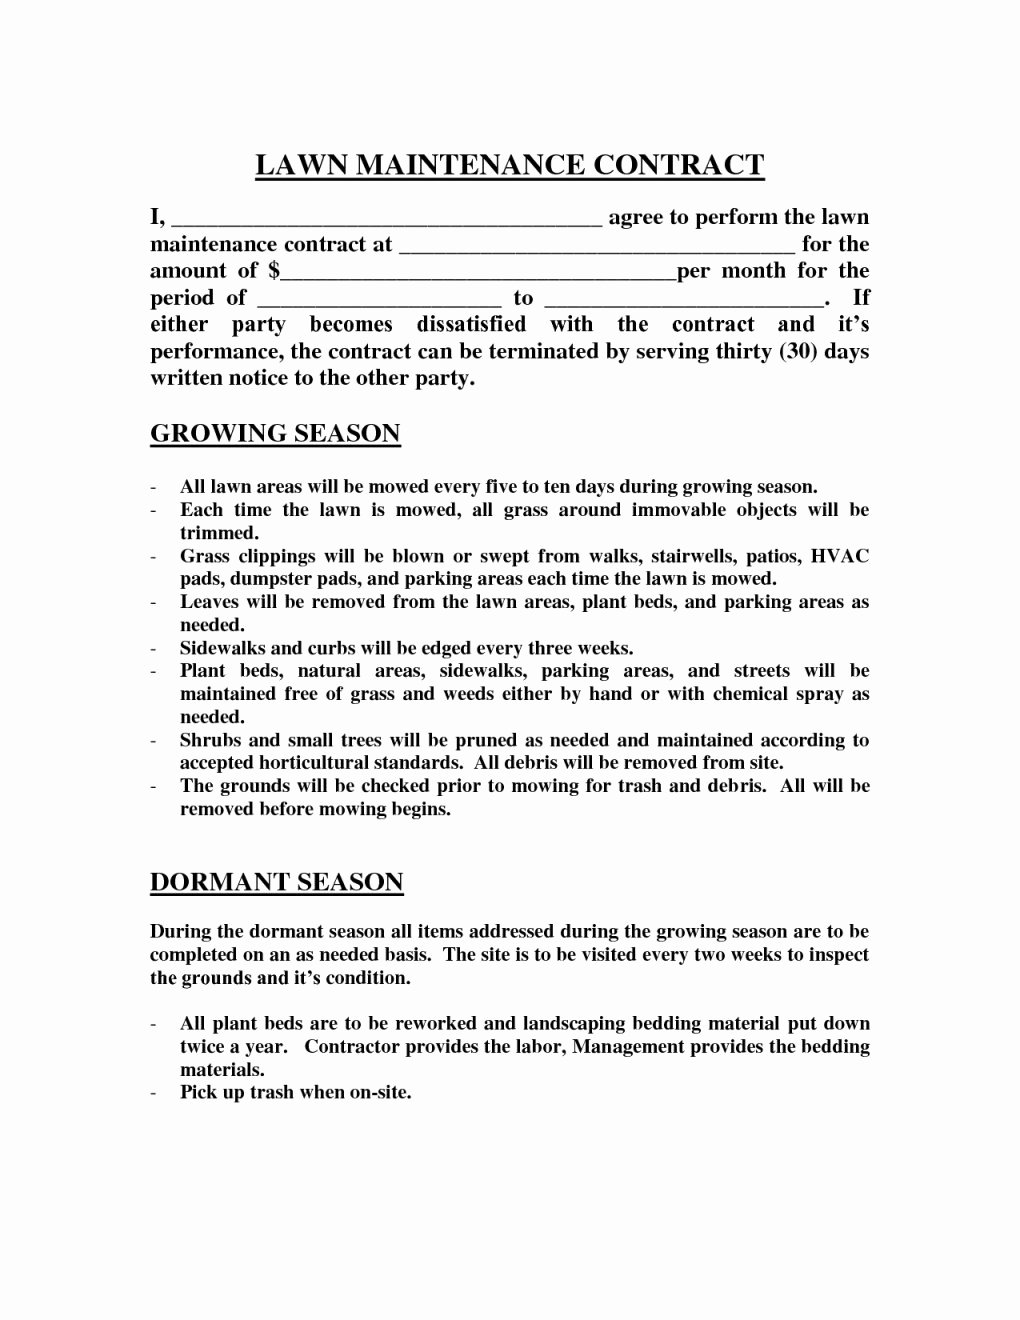 Master Service Agreement Template Beautiful Master Service Agreement Template Marketing